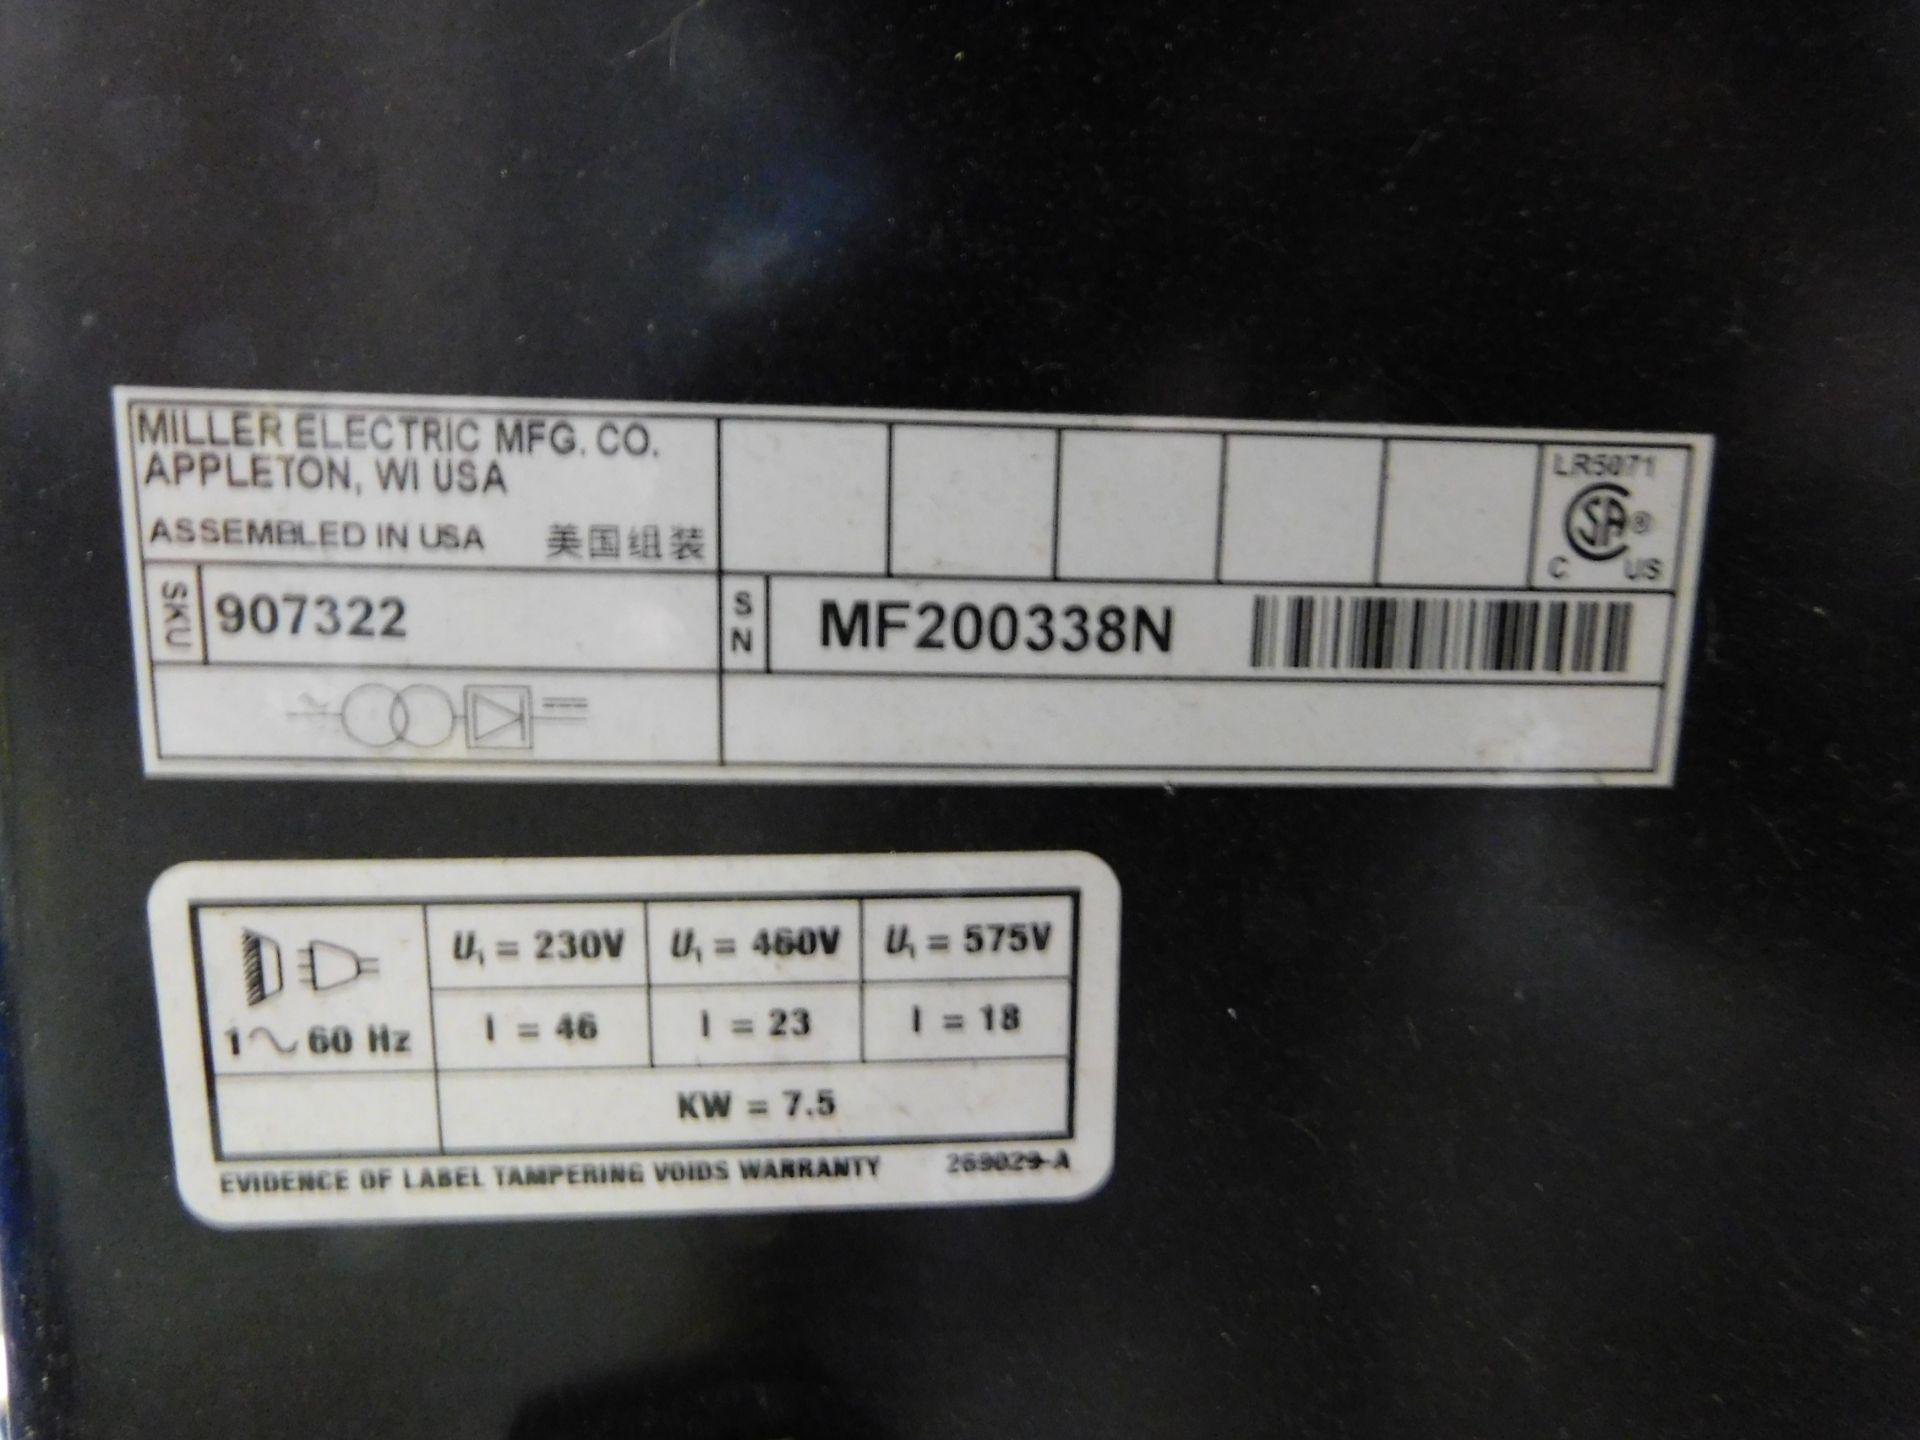 Lot 114 - Miller Millermatic 252 Mig Welder, SN MF200338N, with Mig Gun, Ground Cable, and Regulator, 220V,